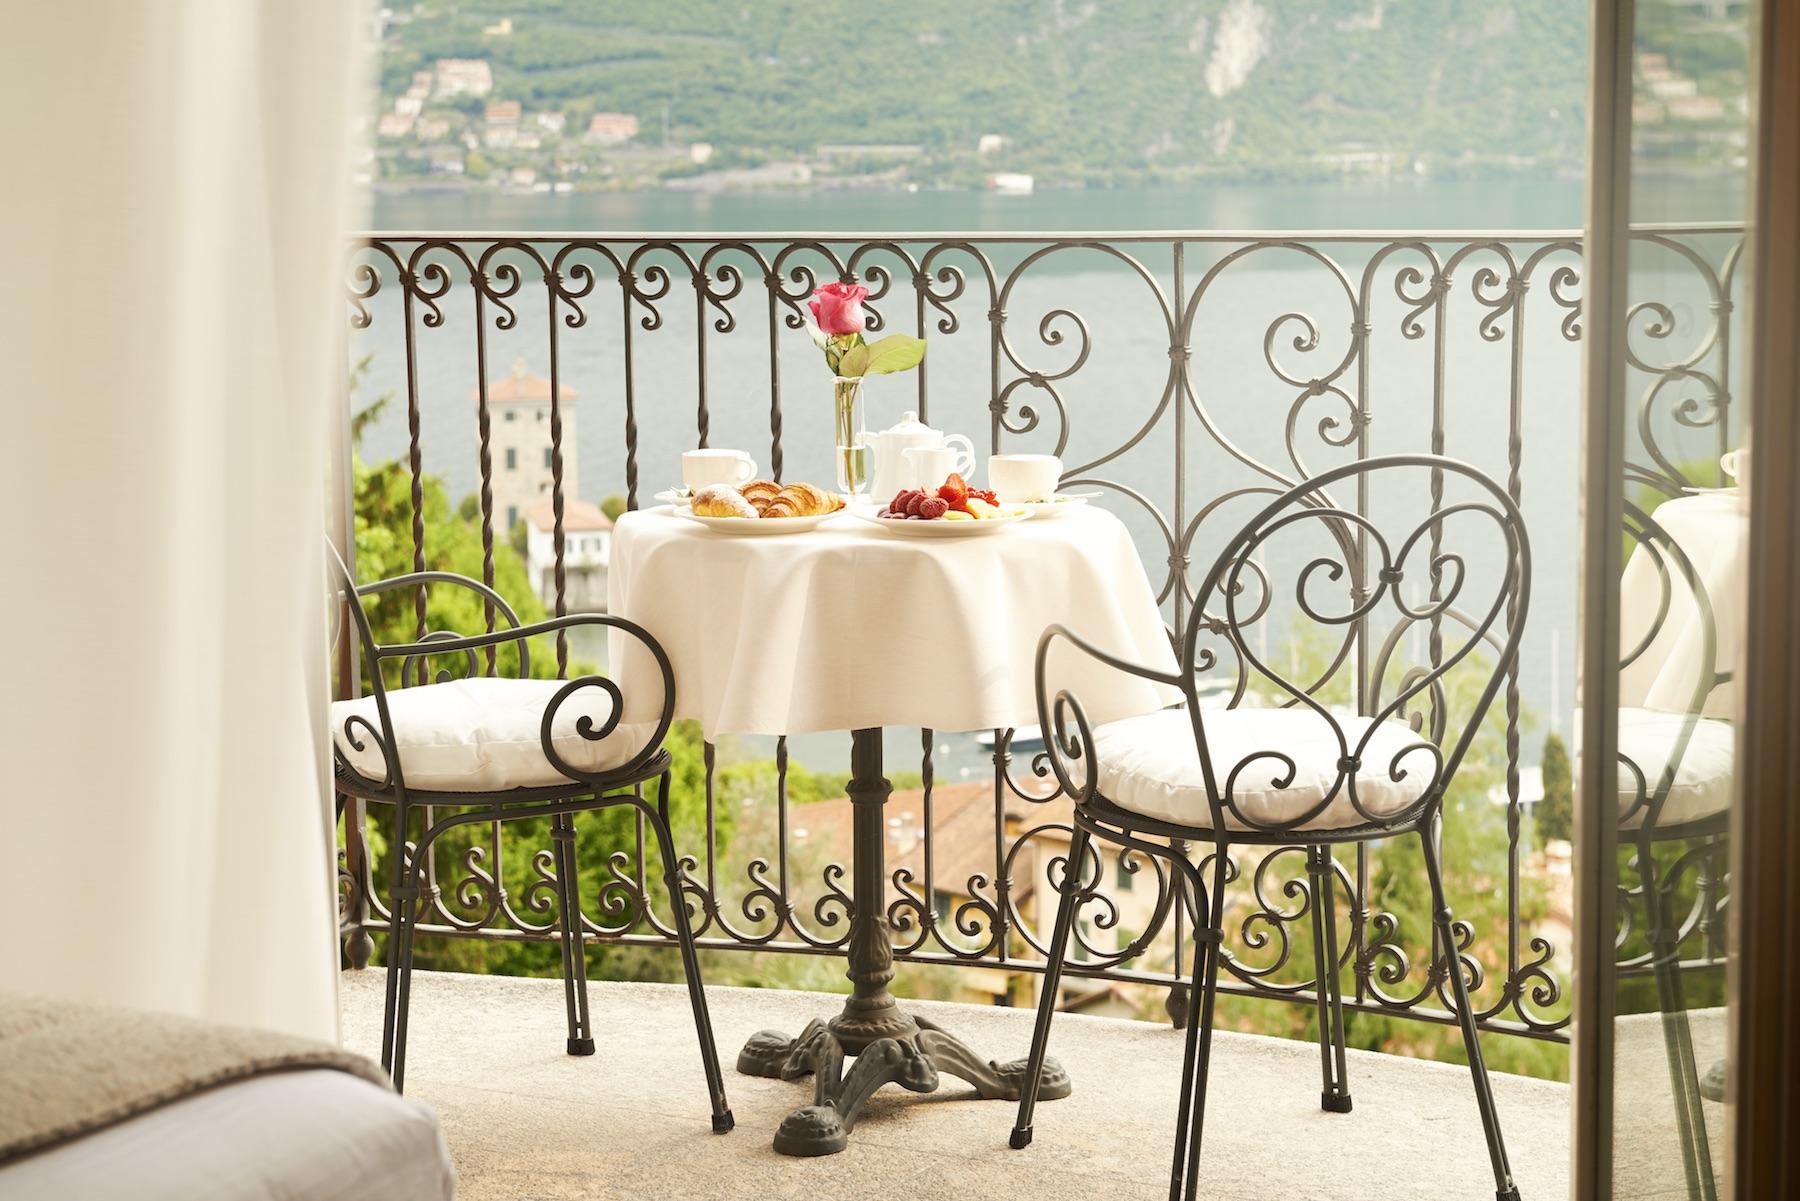 20 Best Lake Como Holiday images | Lake como, …